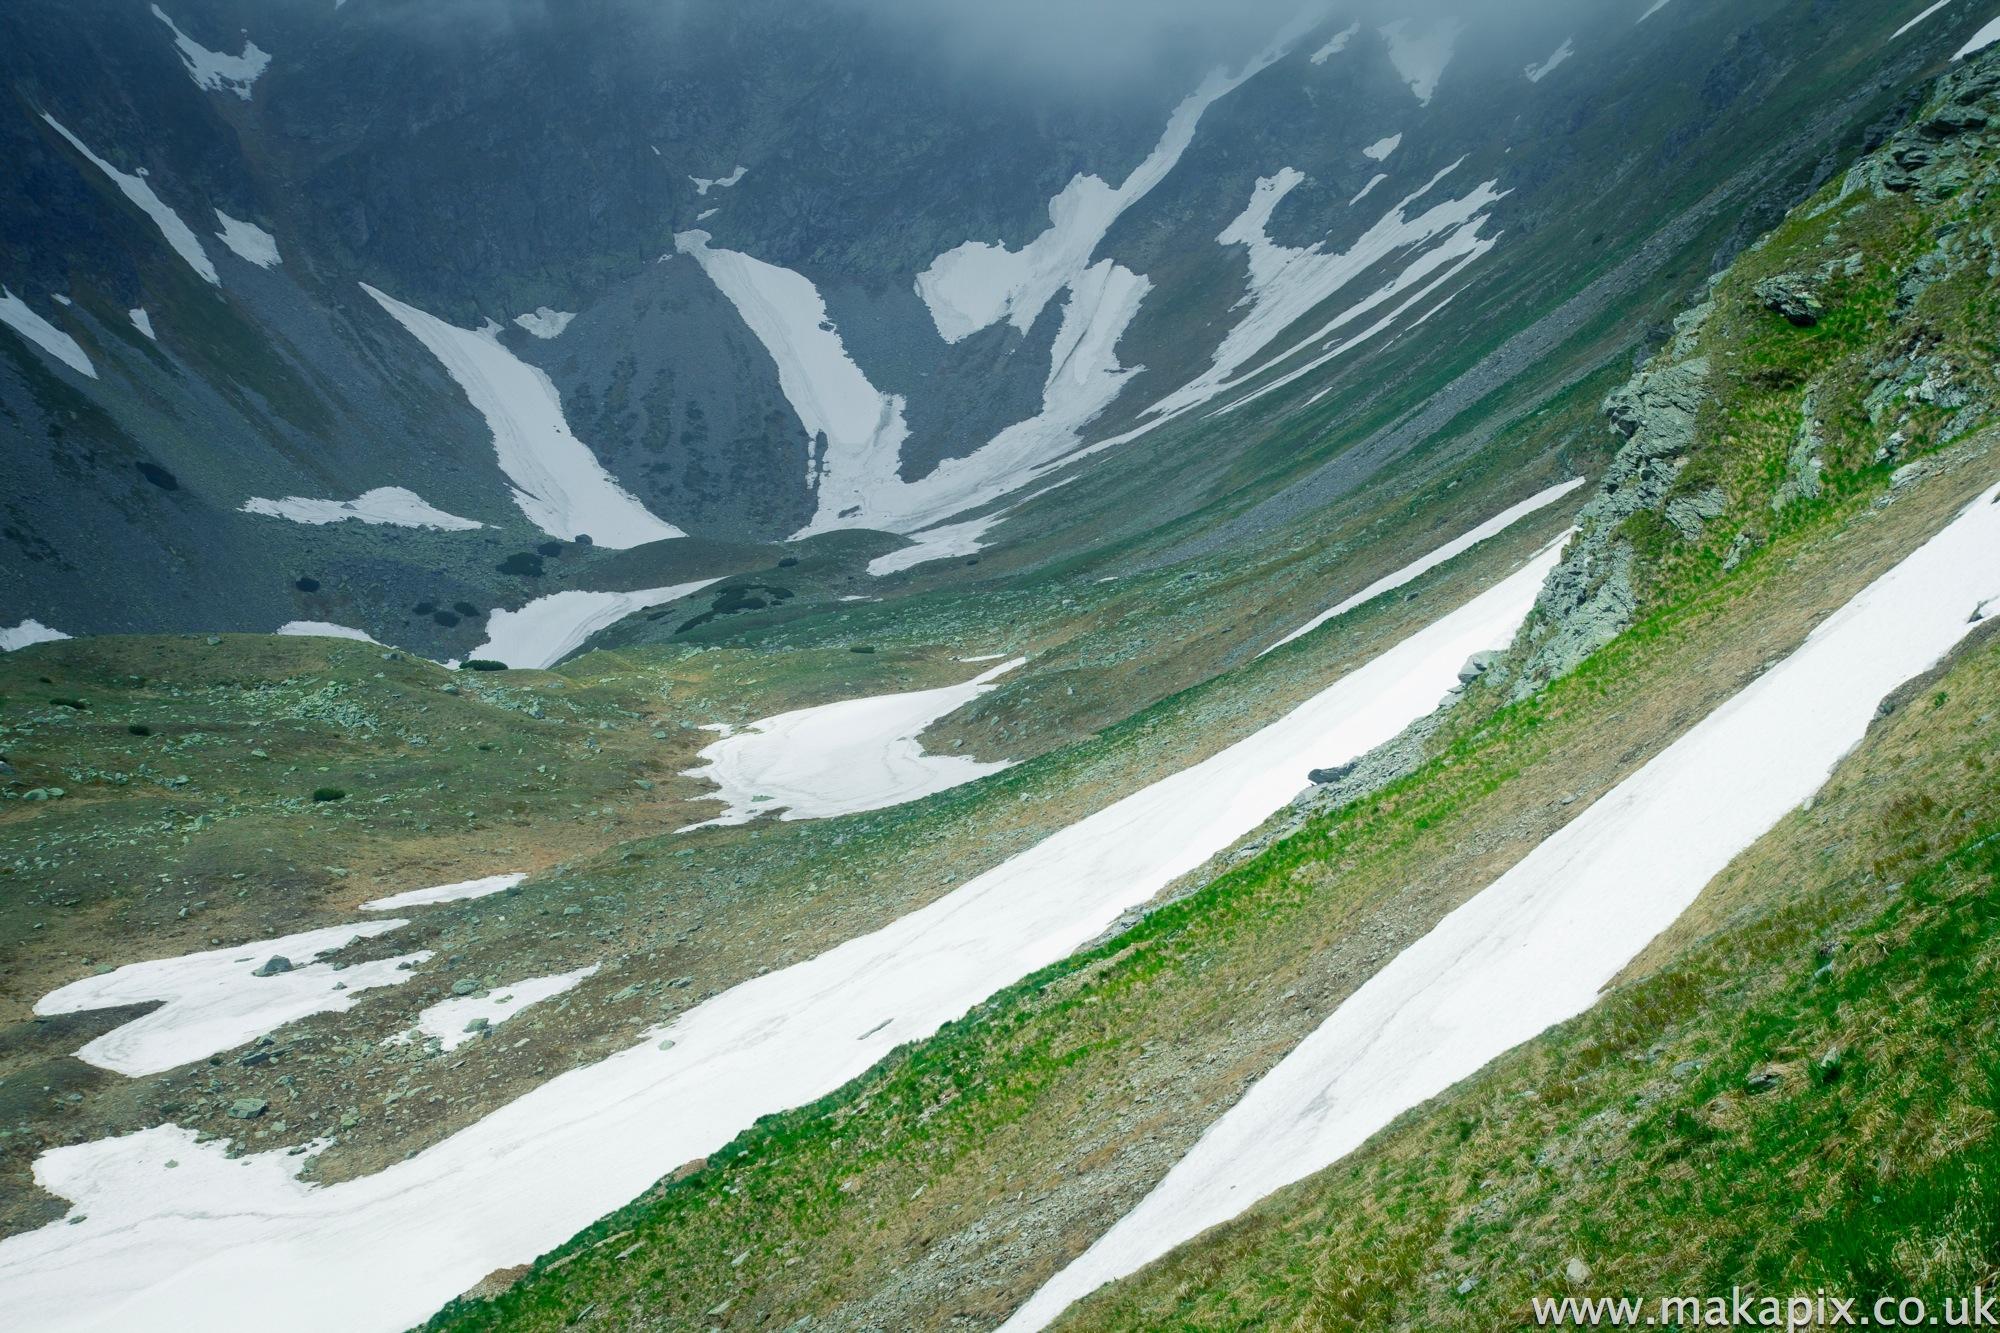 Bystra,West Tatras, Slovakia 2014